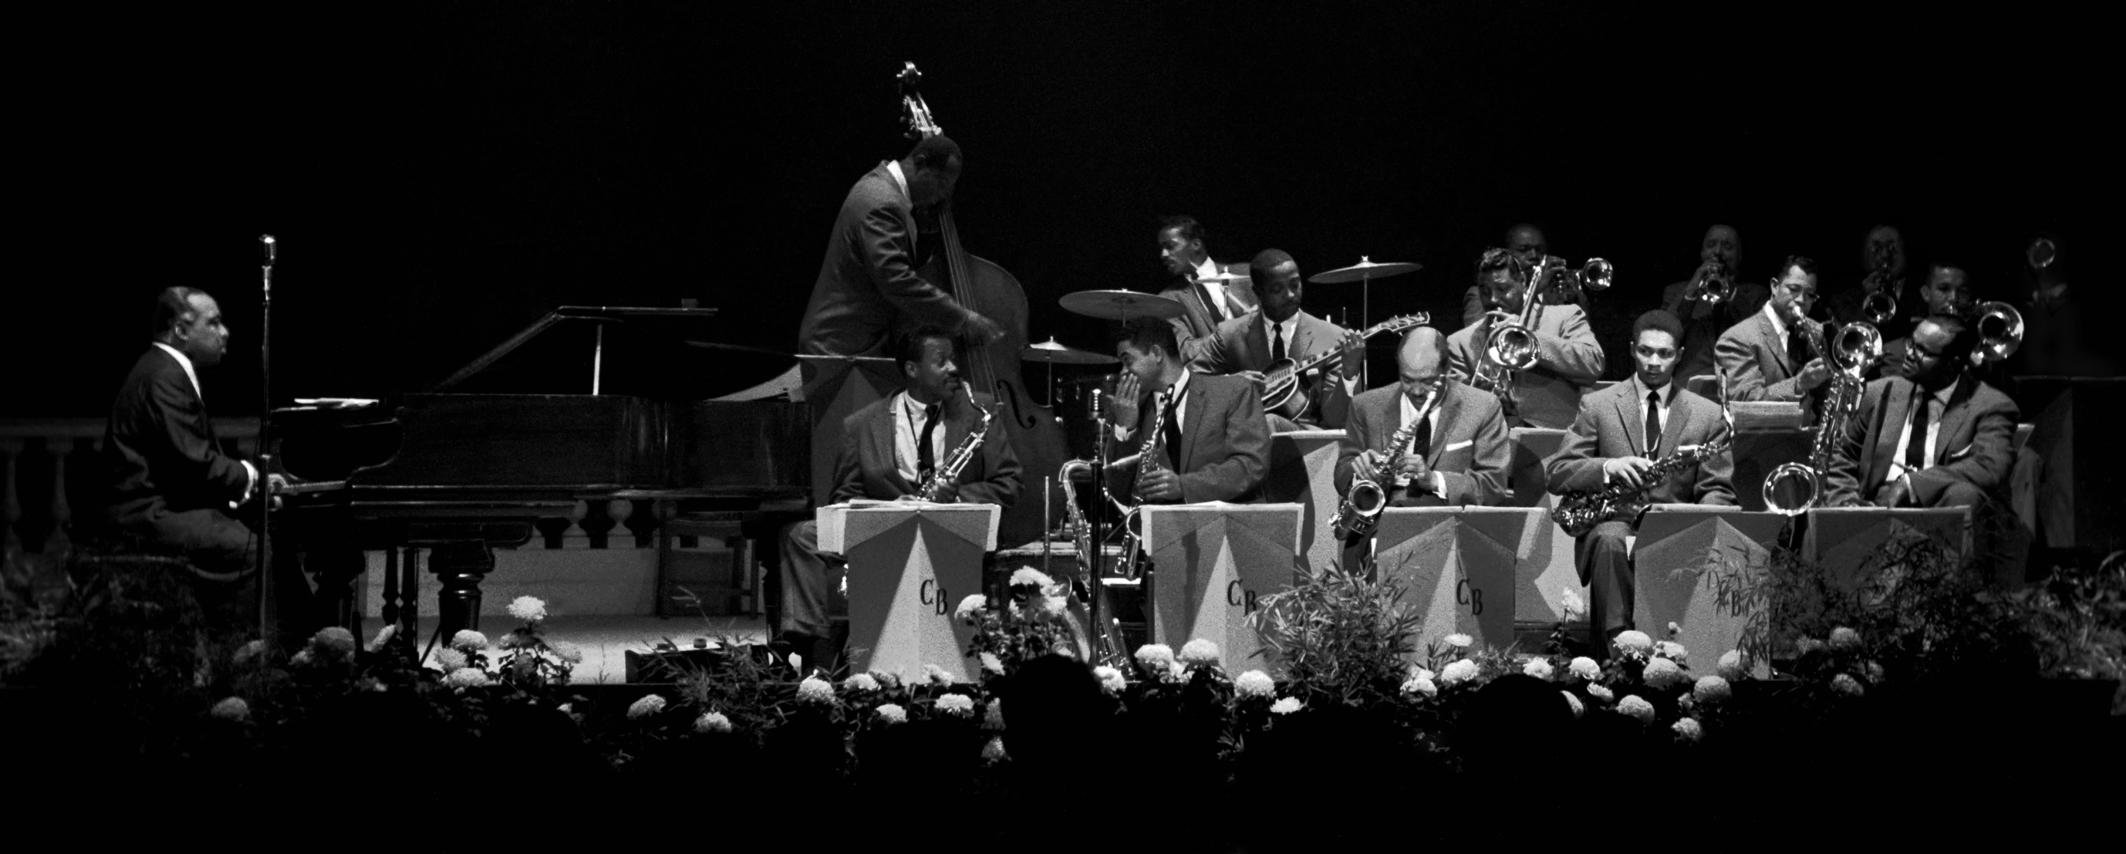 Basie Band